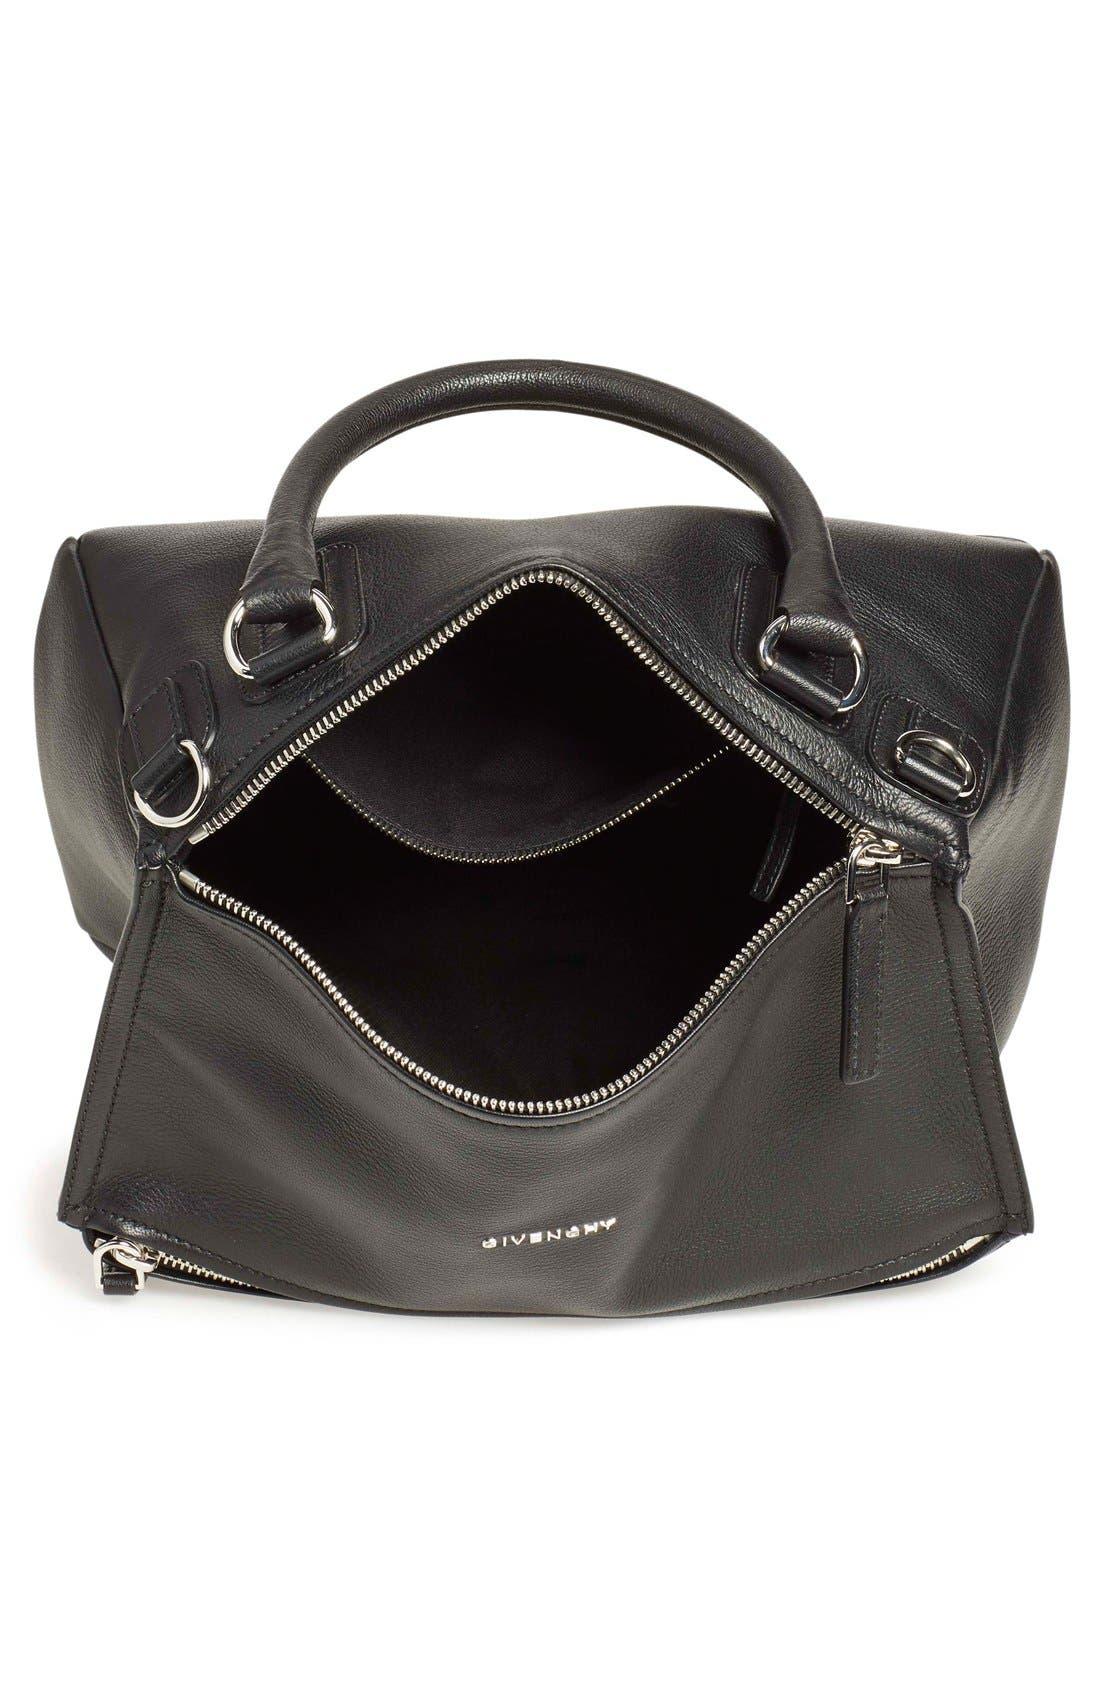 'Medium Pandora' Sugar Leather Satchel,                             Alternate thumbnail 4, color,                             Black